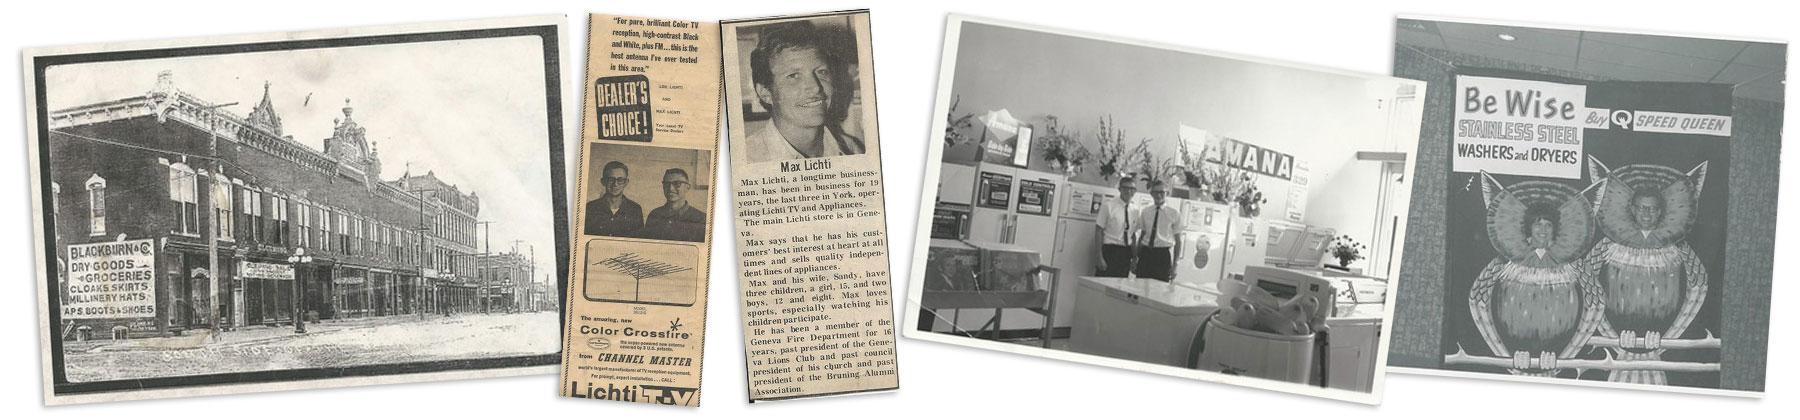 Lichti's Newspaper Clippings